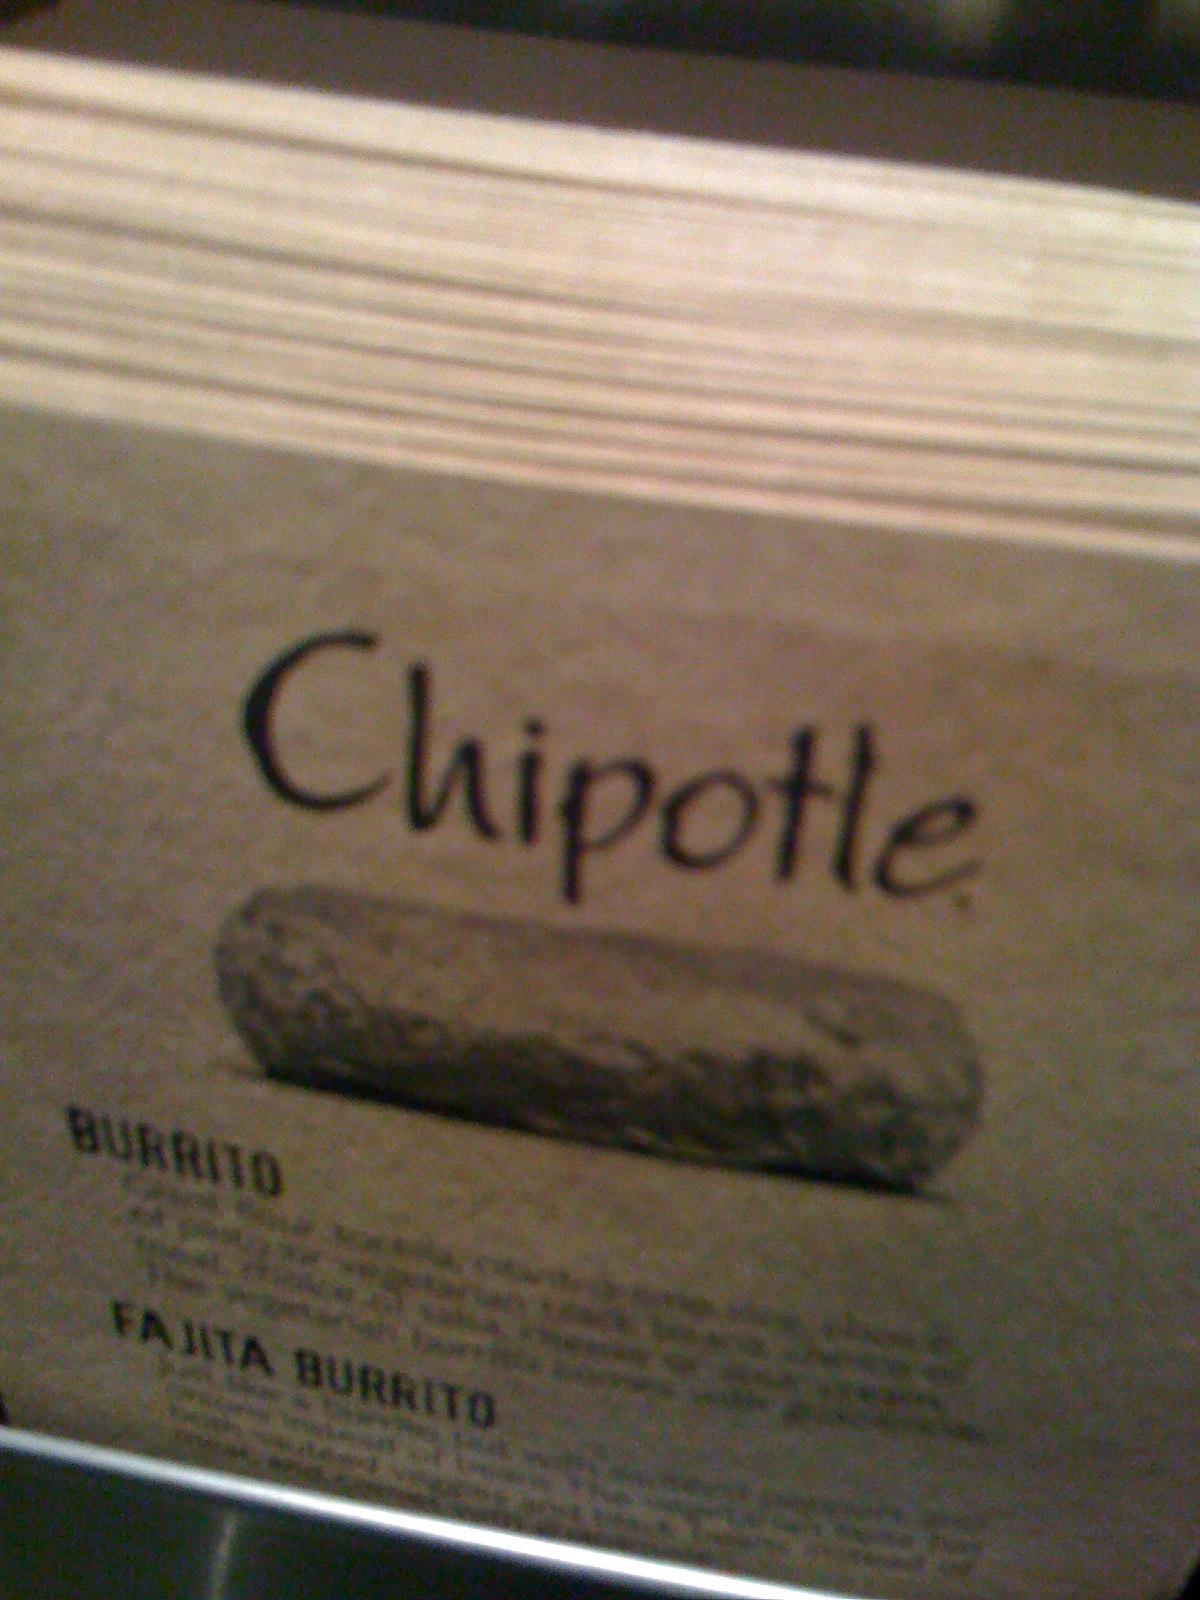 Mmmmm Chipotle Unwind